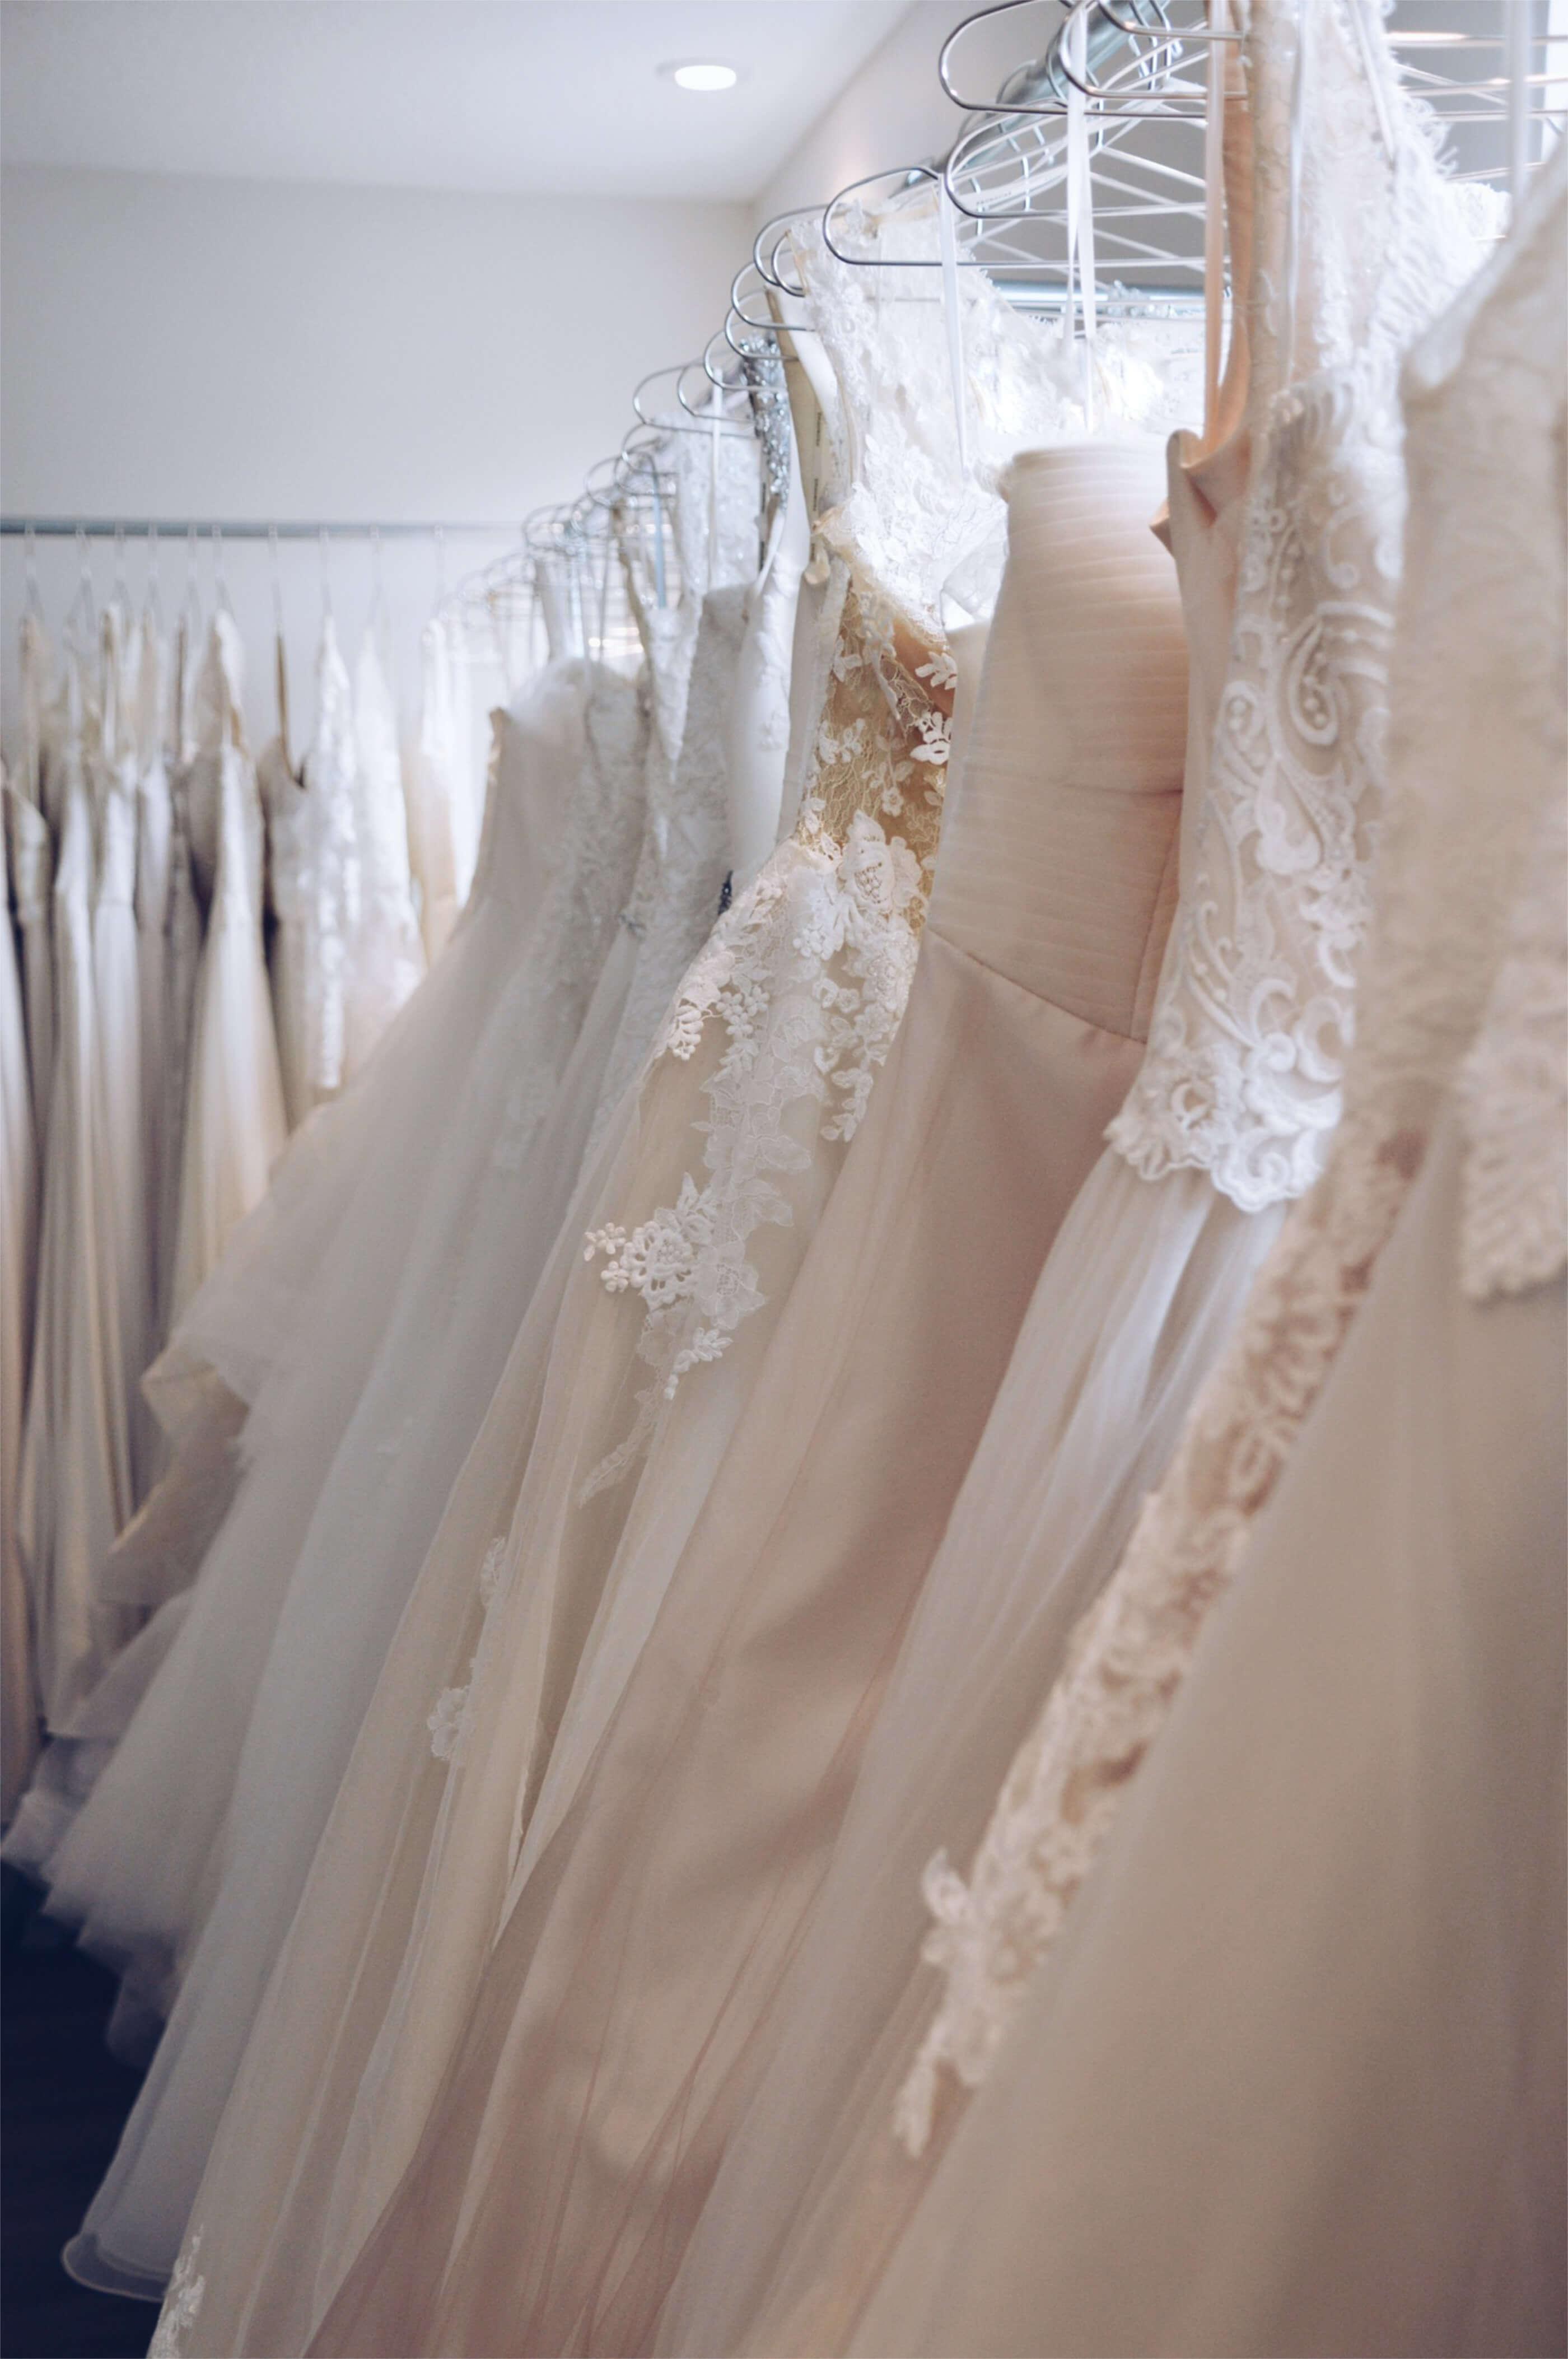 Discount Wedding Dresses Near Me In Jacksonville Fl